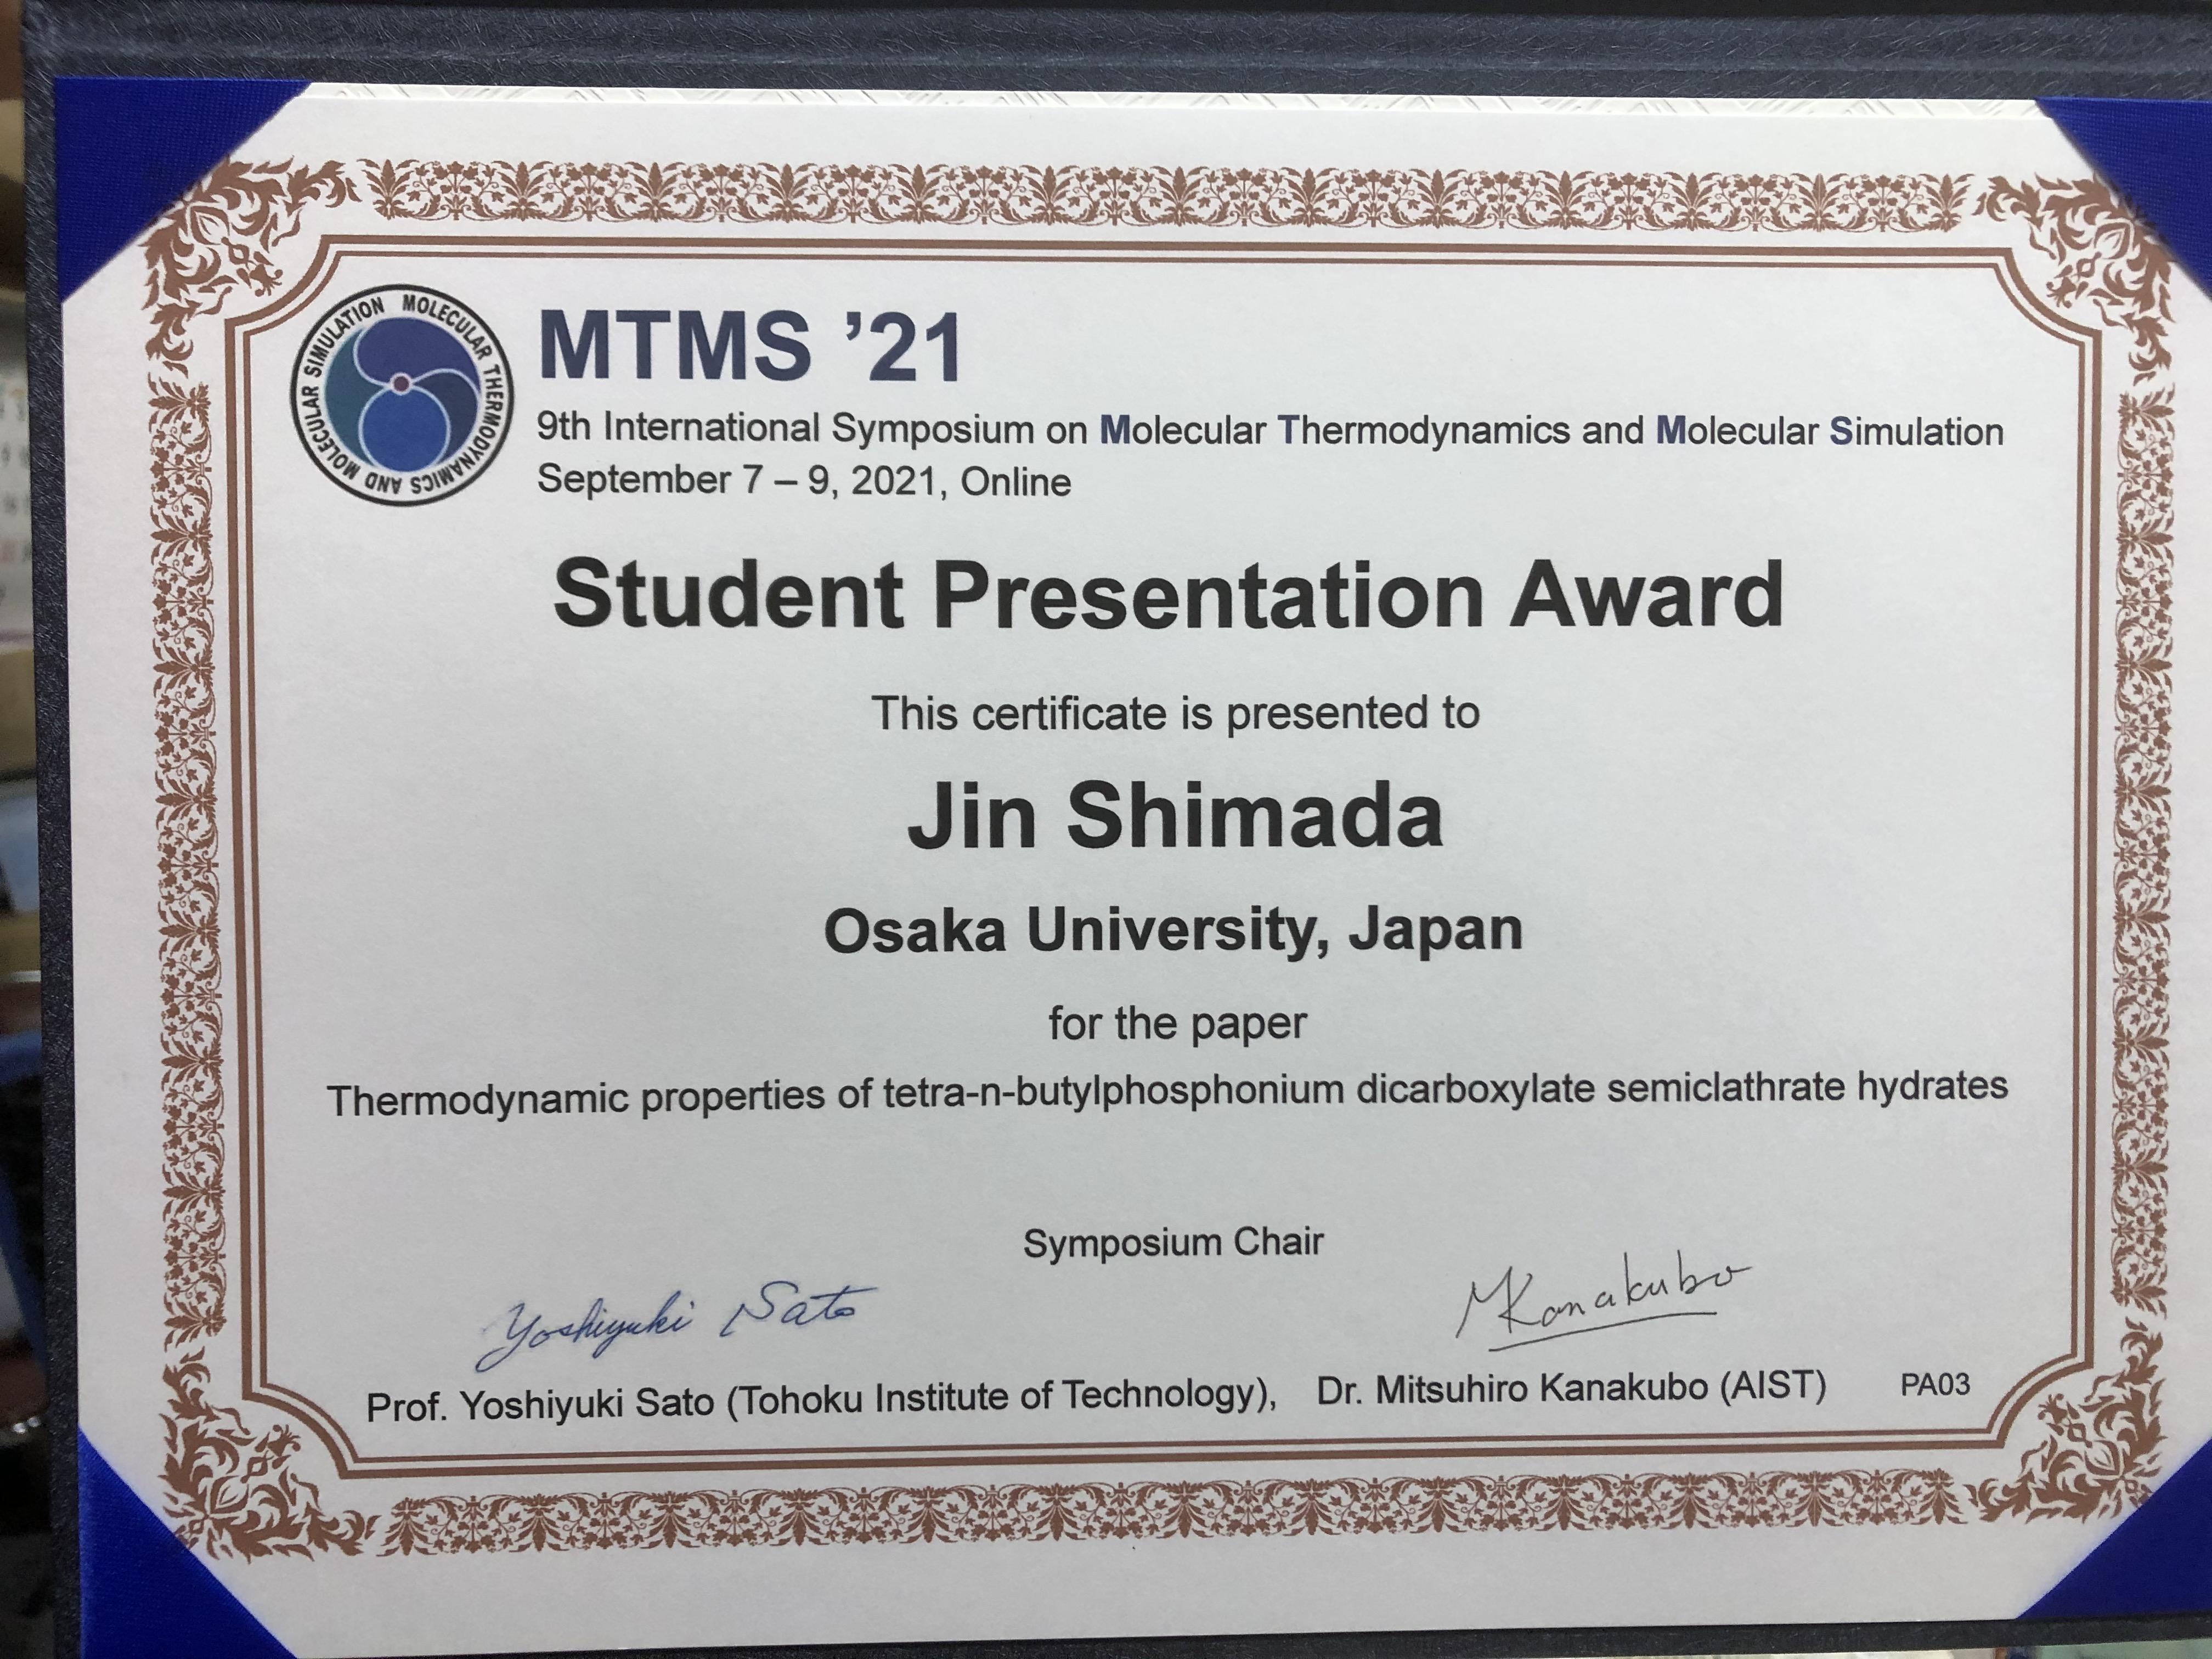 Student Presentation Award to Mr. Shimada